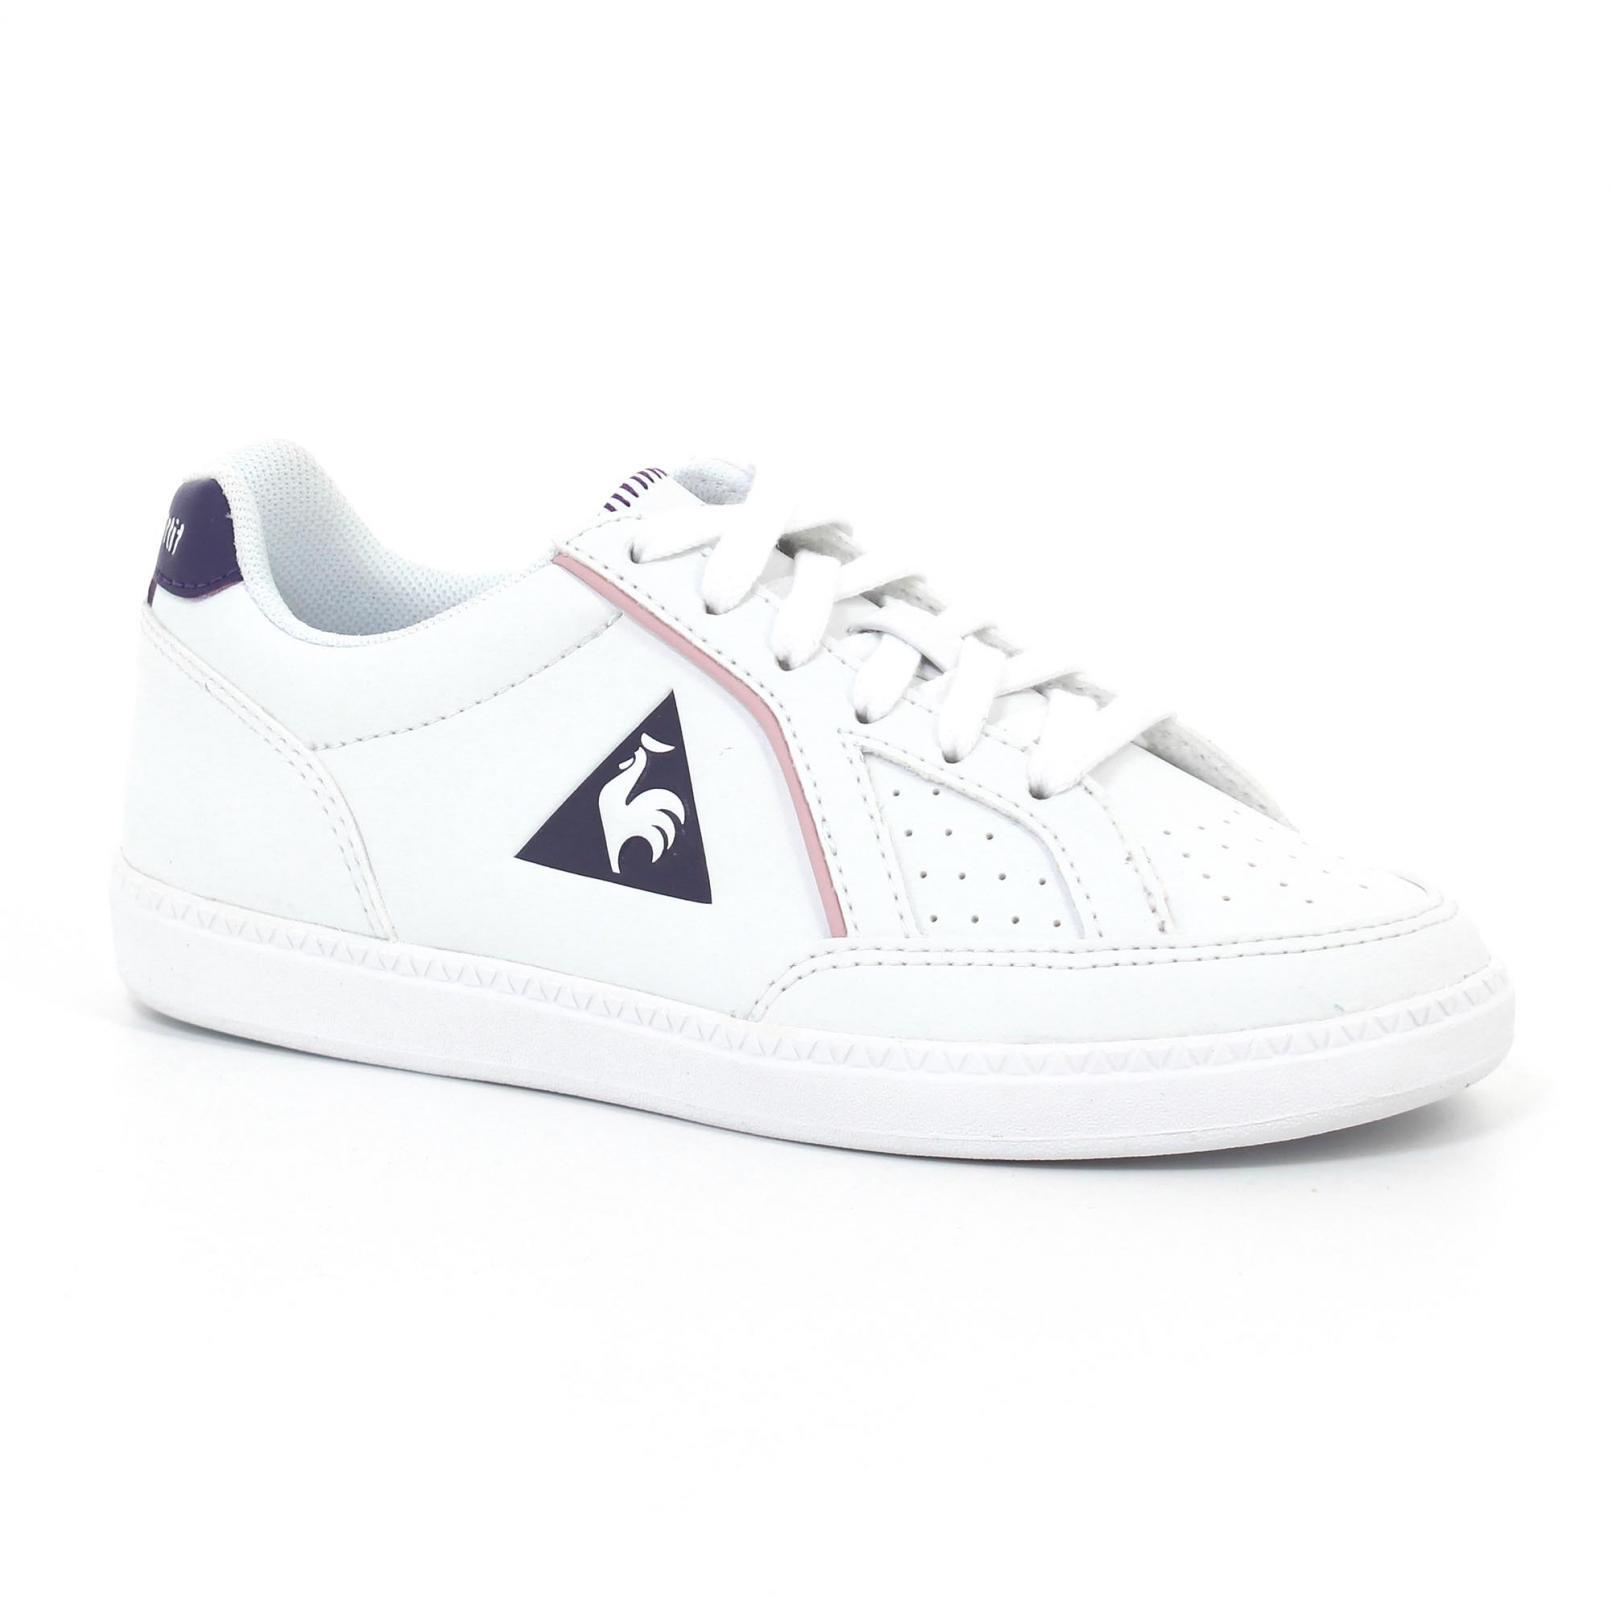 hot sale online 652ed d1154 Black And Blue Jordan 13